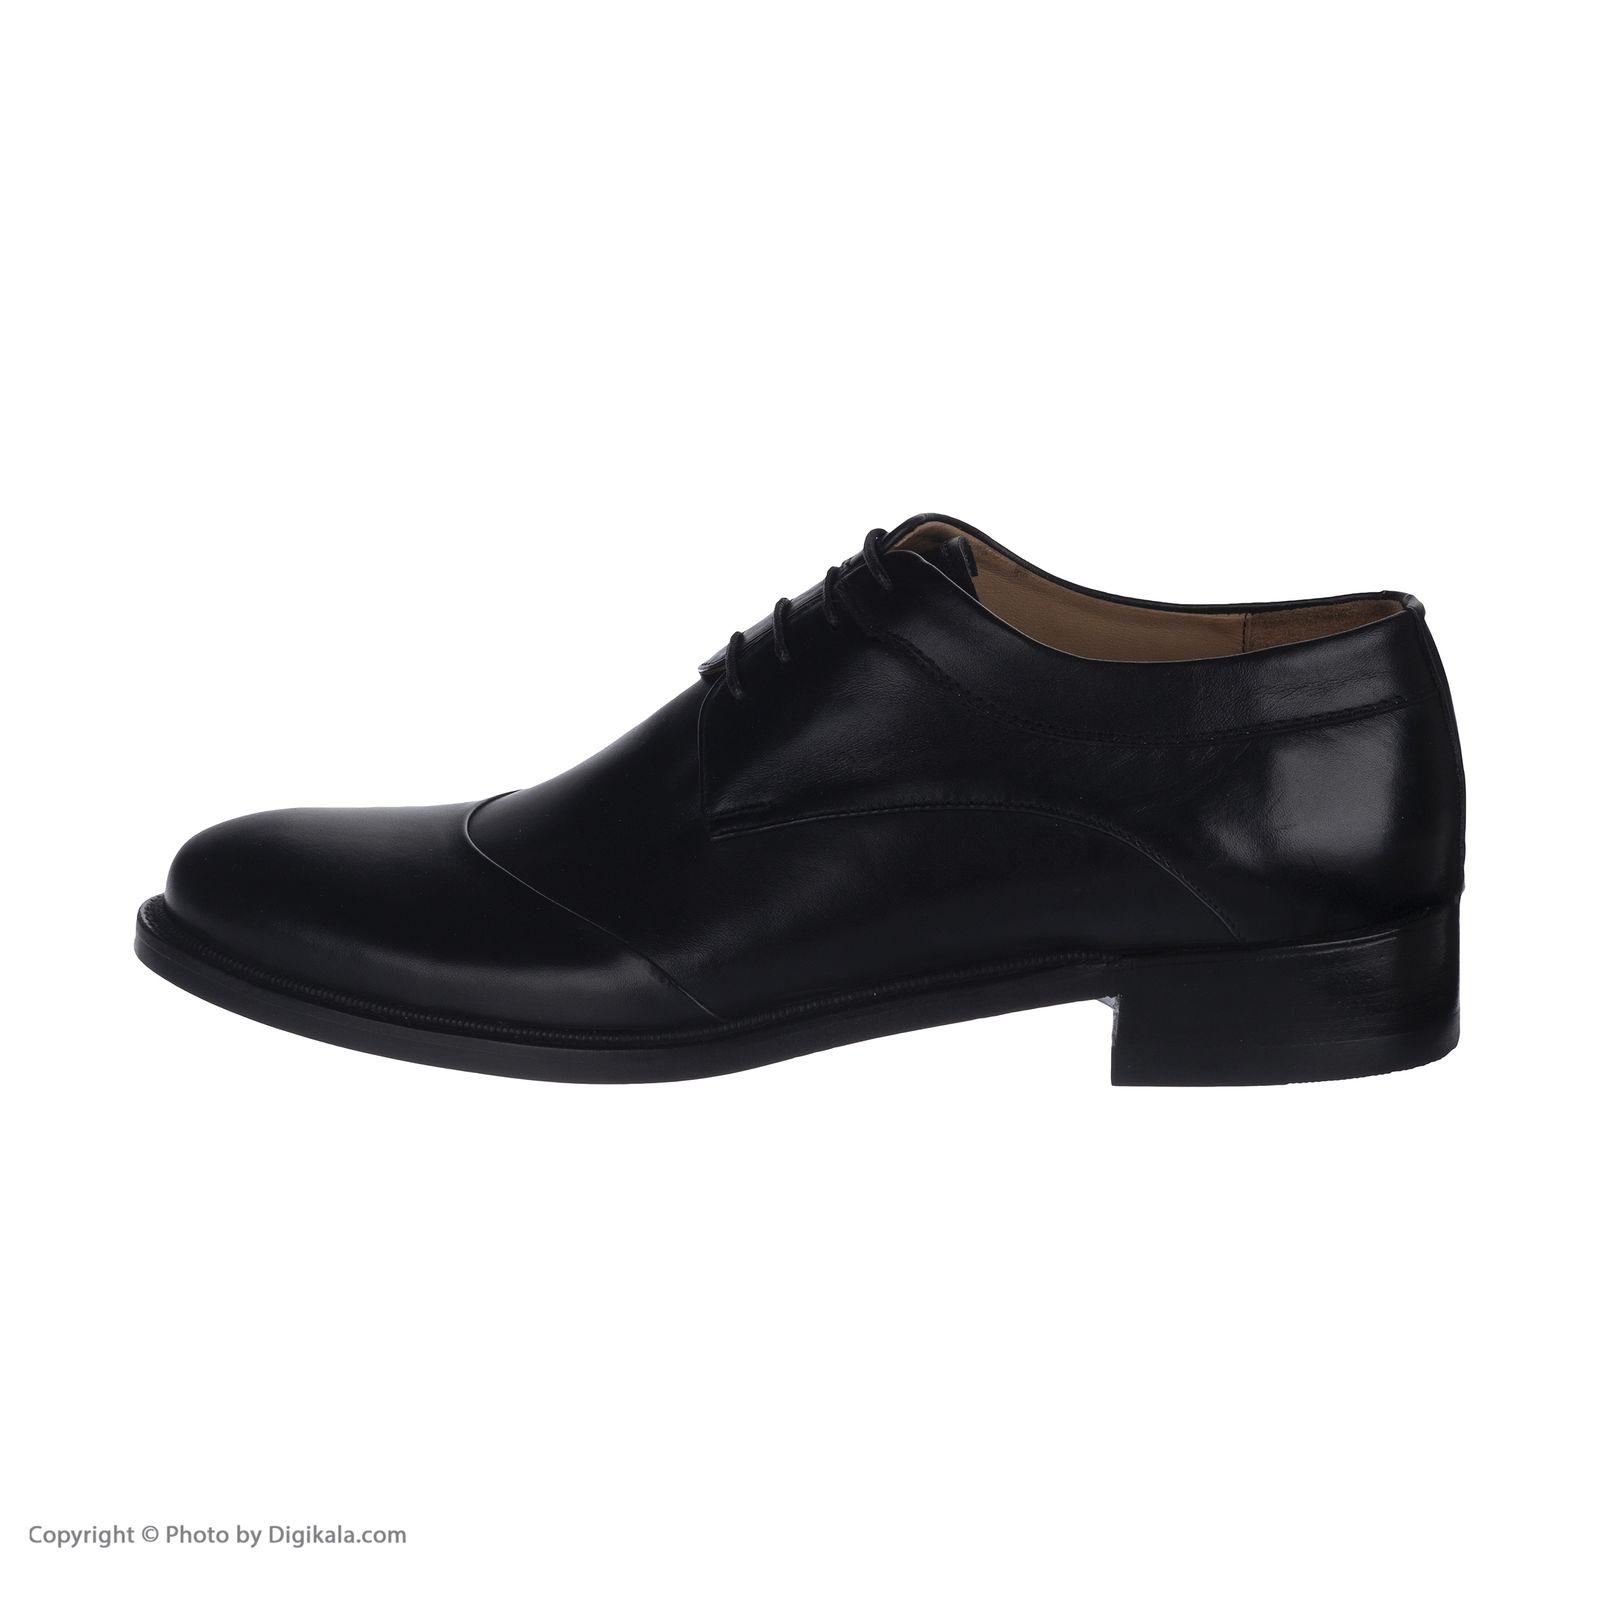 کفش مردانه نظری کد 423 -  - 1